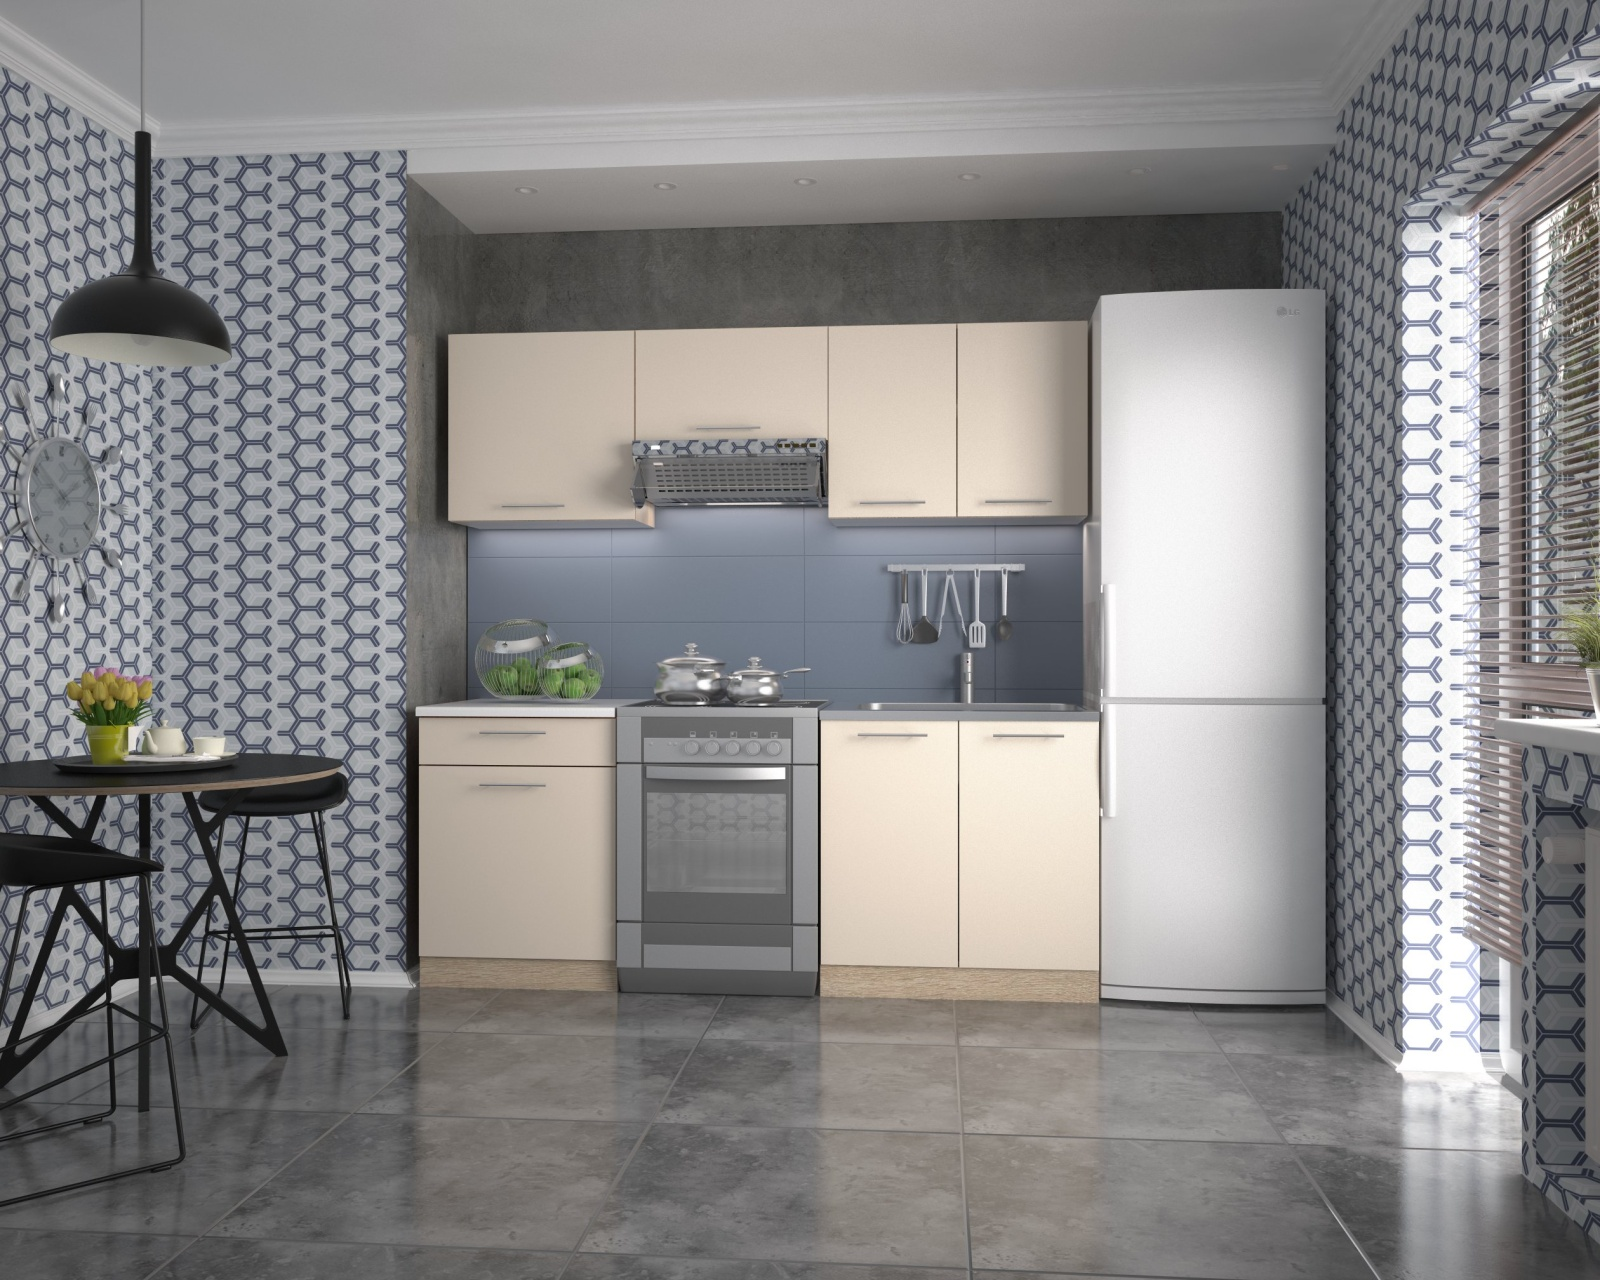 Halmar Kuchyně MARIJIA 200 cm, korpus: dub sonoma, dveře: vanilka